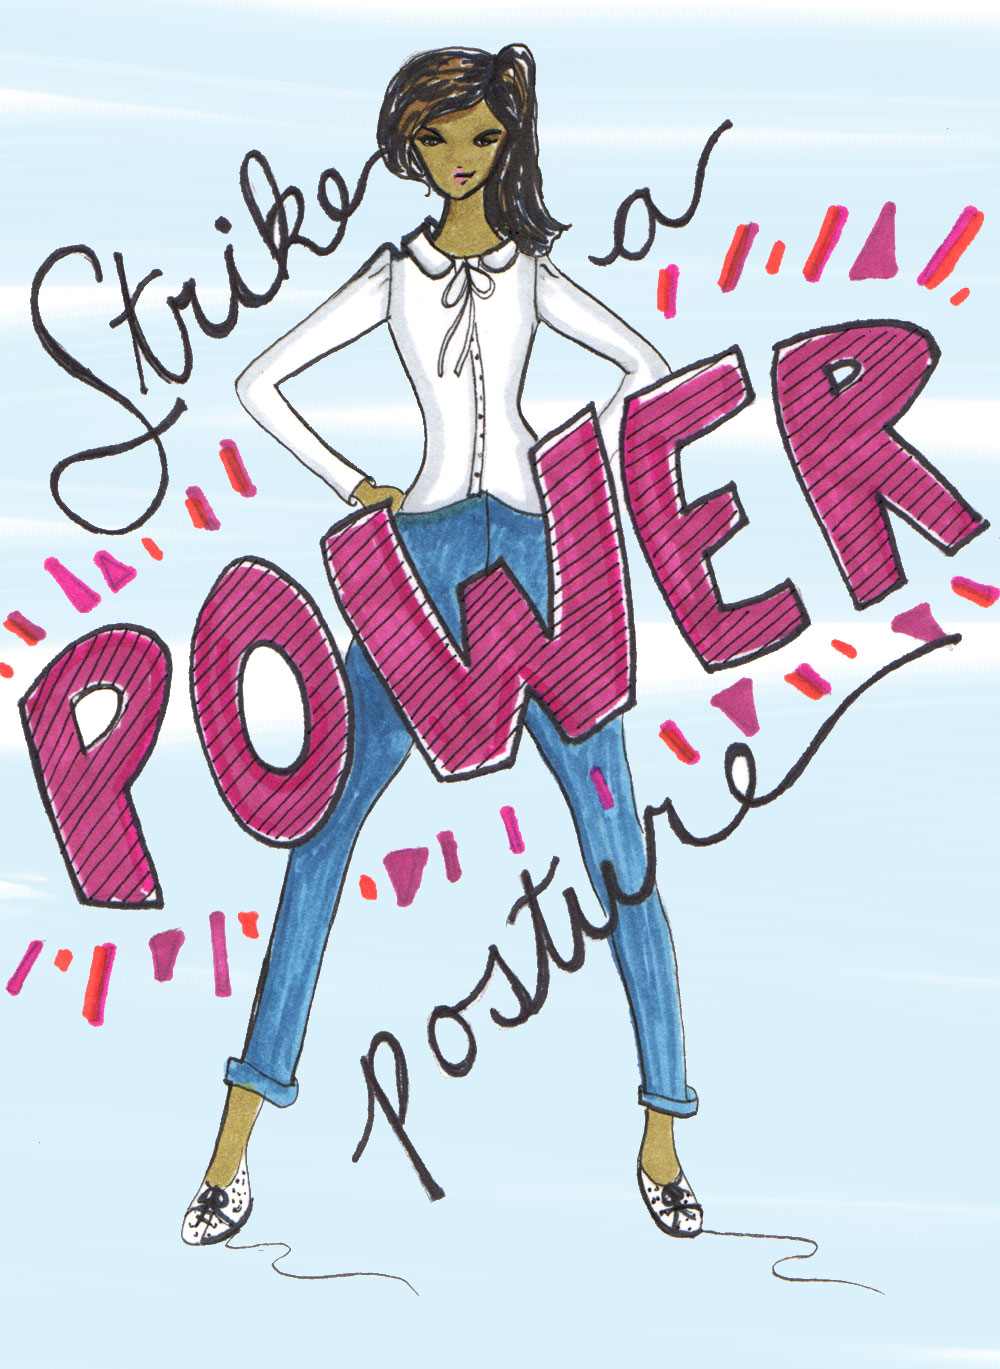 Strike-A-Power-Posture.jpg